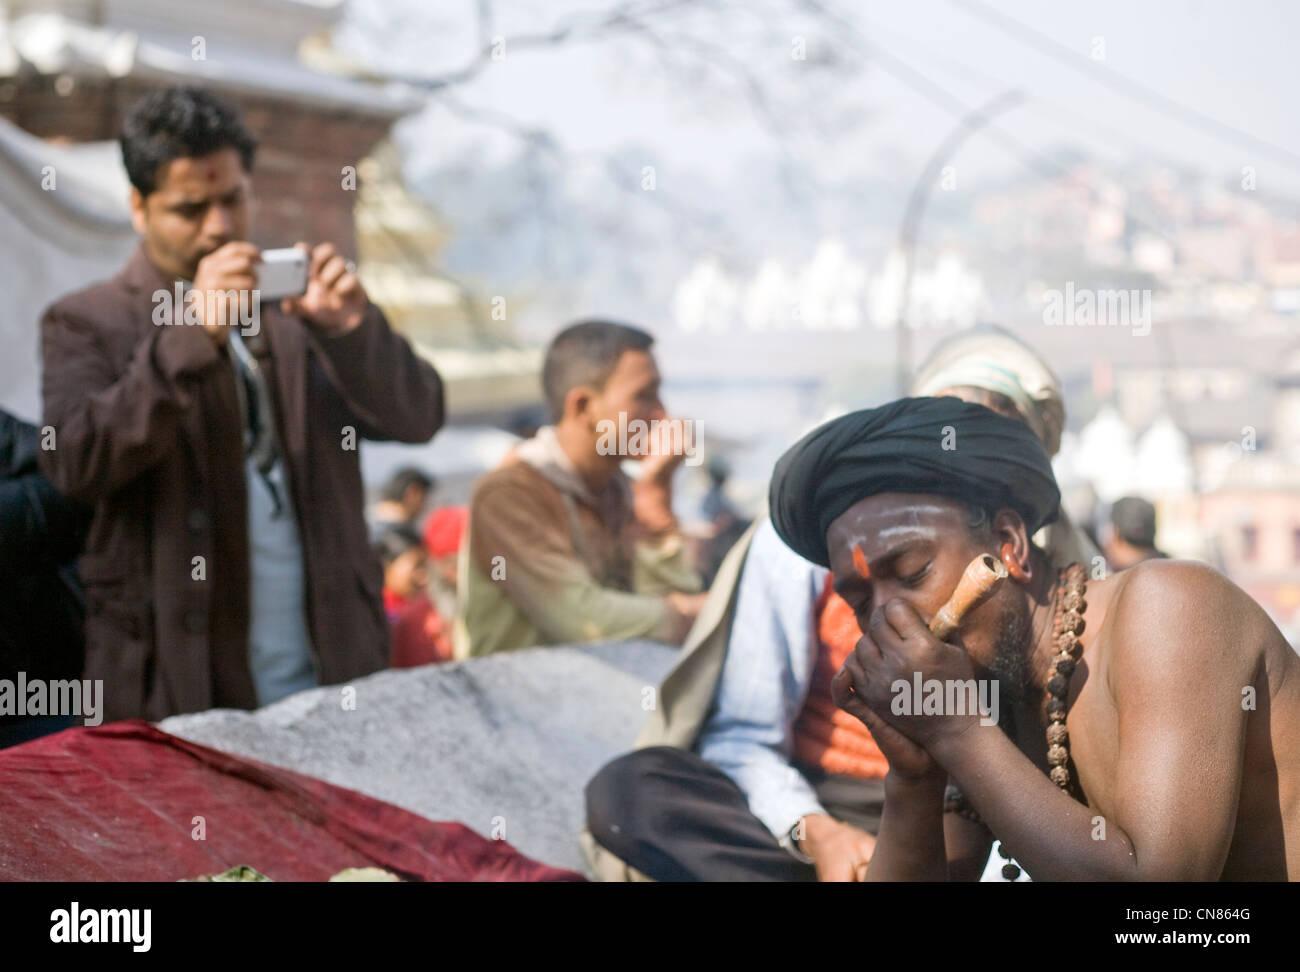 Man photographing sadhu smoking pipe during the annual Shivaratri  festival at  Pashupatinath temple , Kathmandu Stock Photo